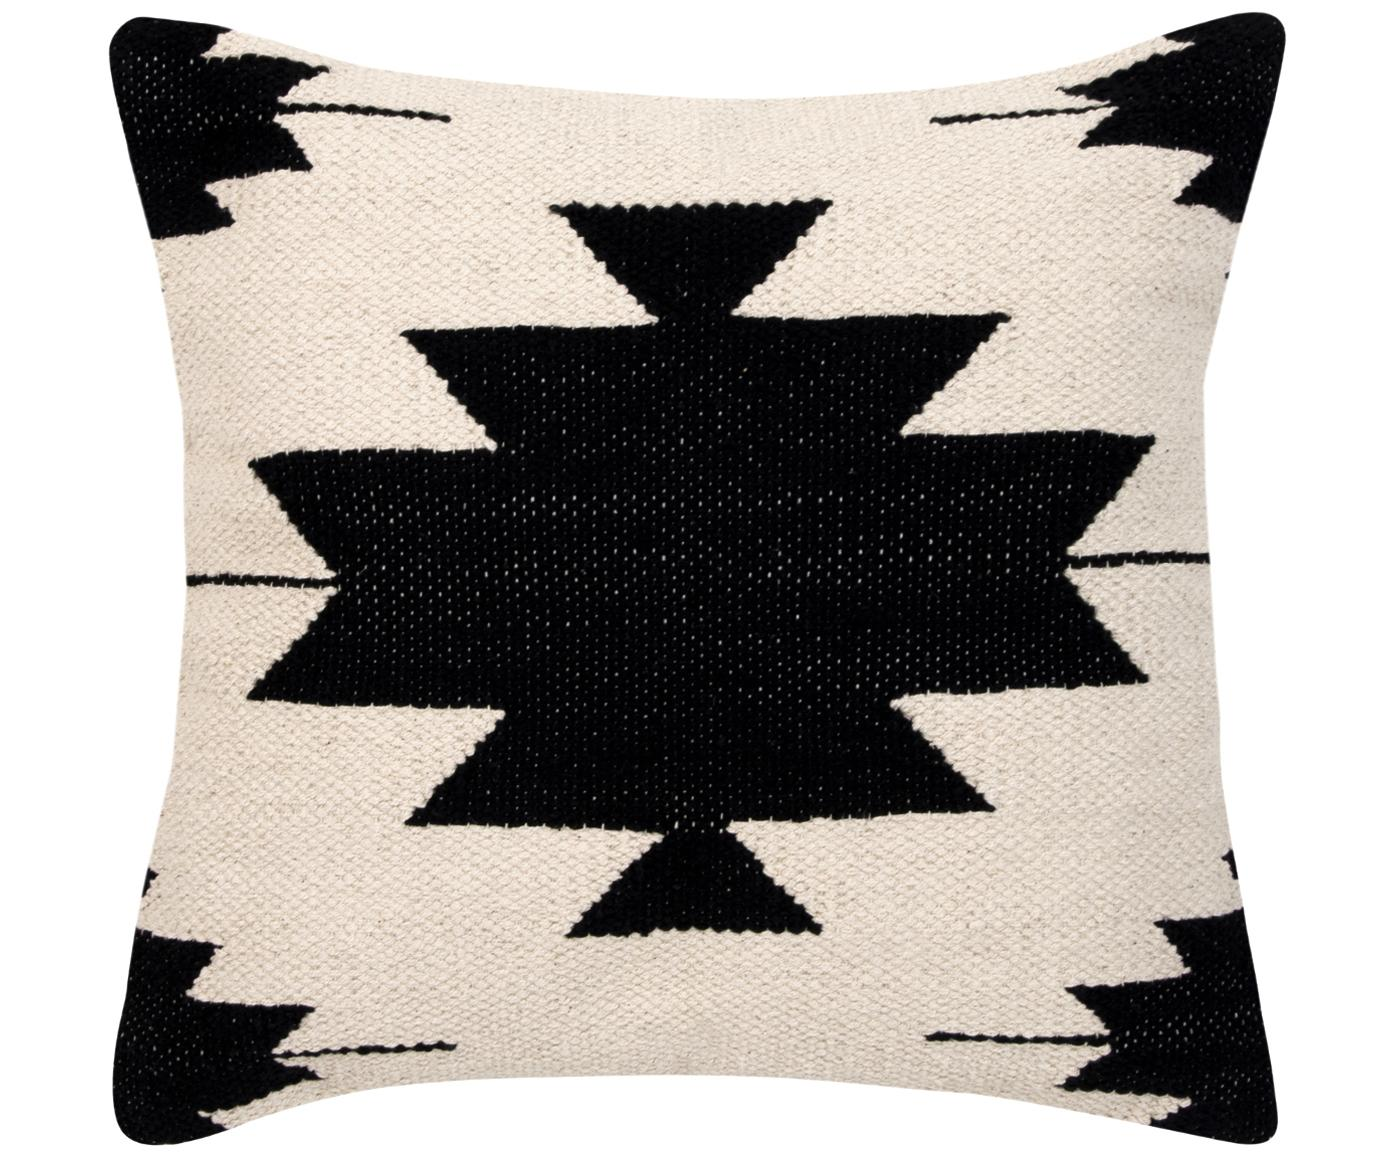 Kussenhoes Cancun, 100% katoen, Zwart, beige, 45 x 45 cm